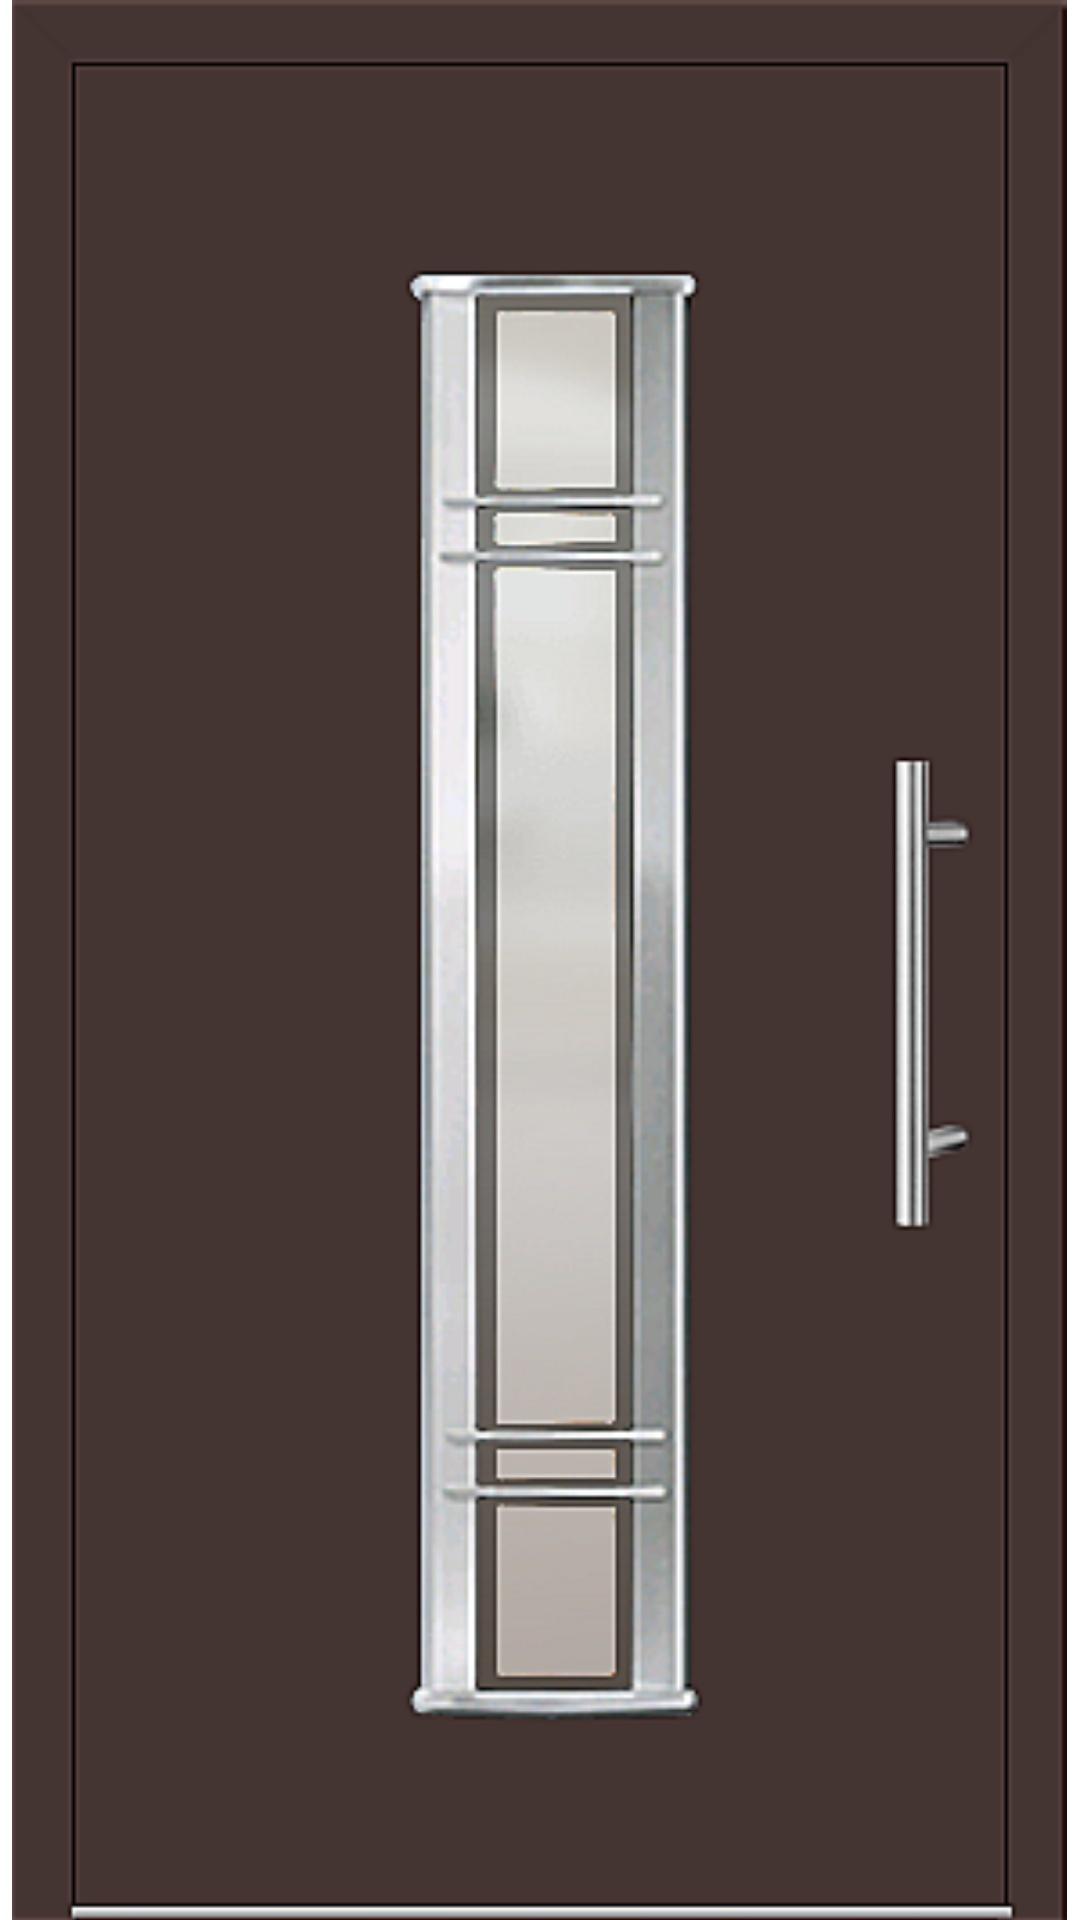 Aluminium Haustür Modell 6962-79 mahagonibraun